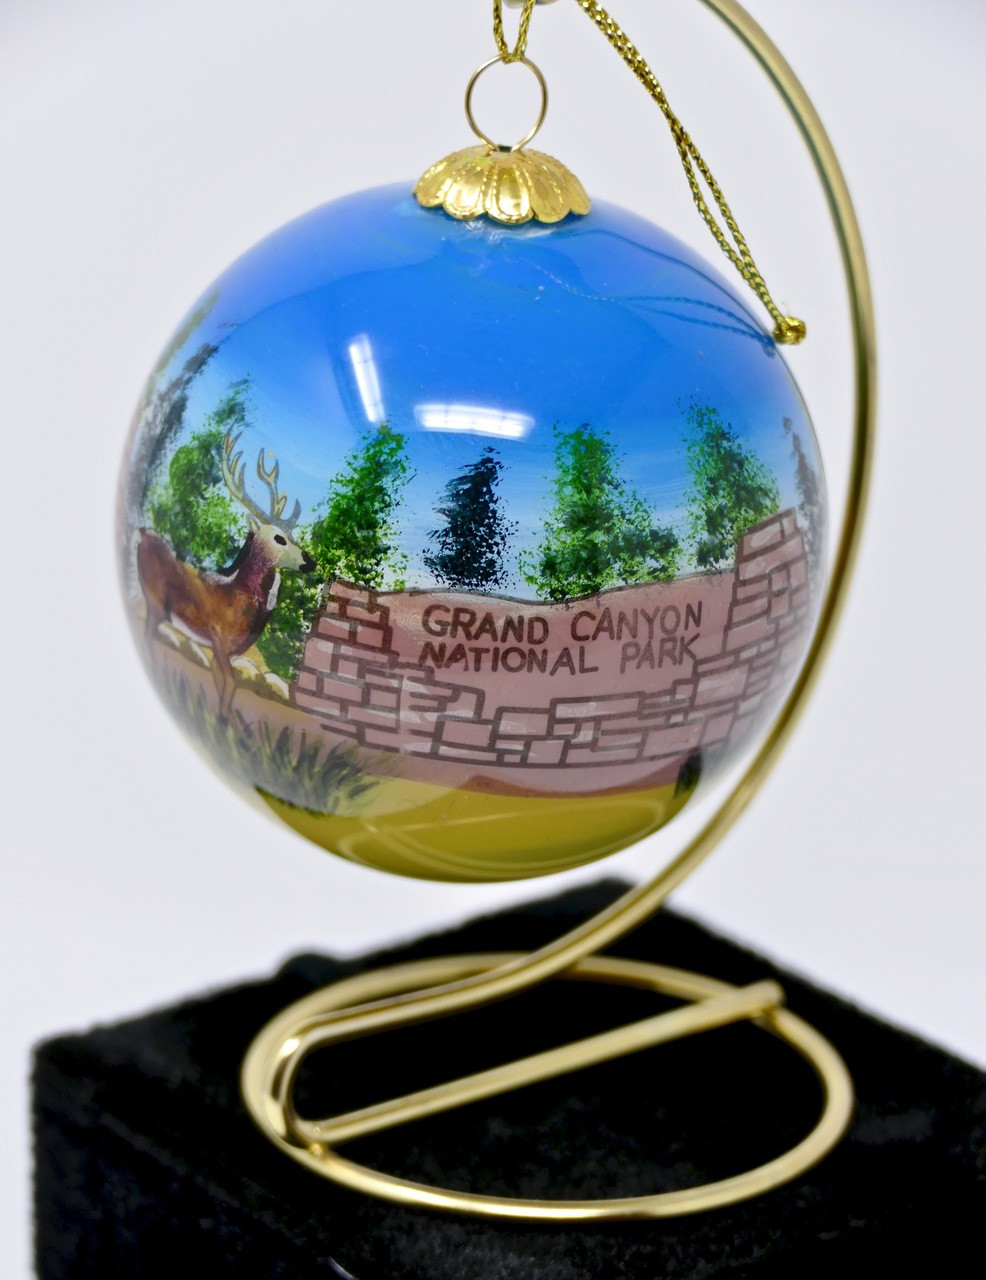 Christmas Ornament Grand Canyon Sign Painted Glass - Grand Canyon